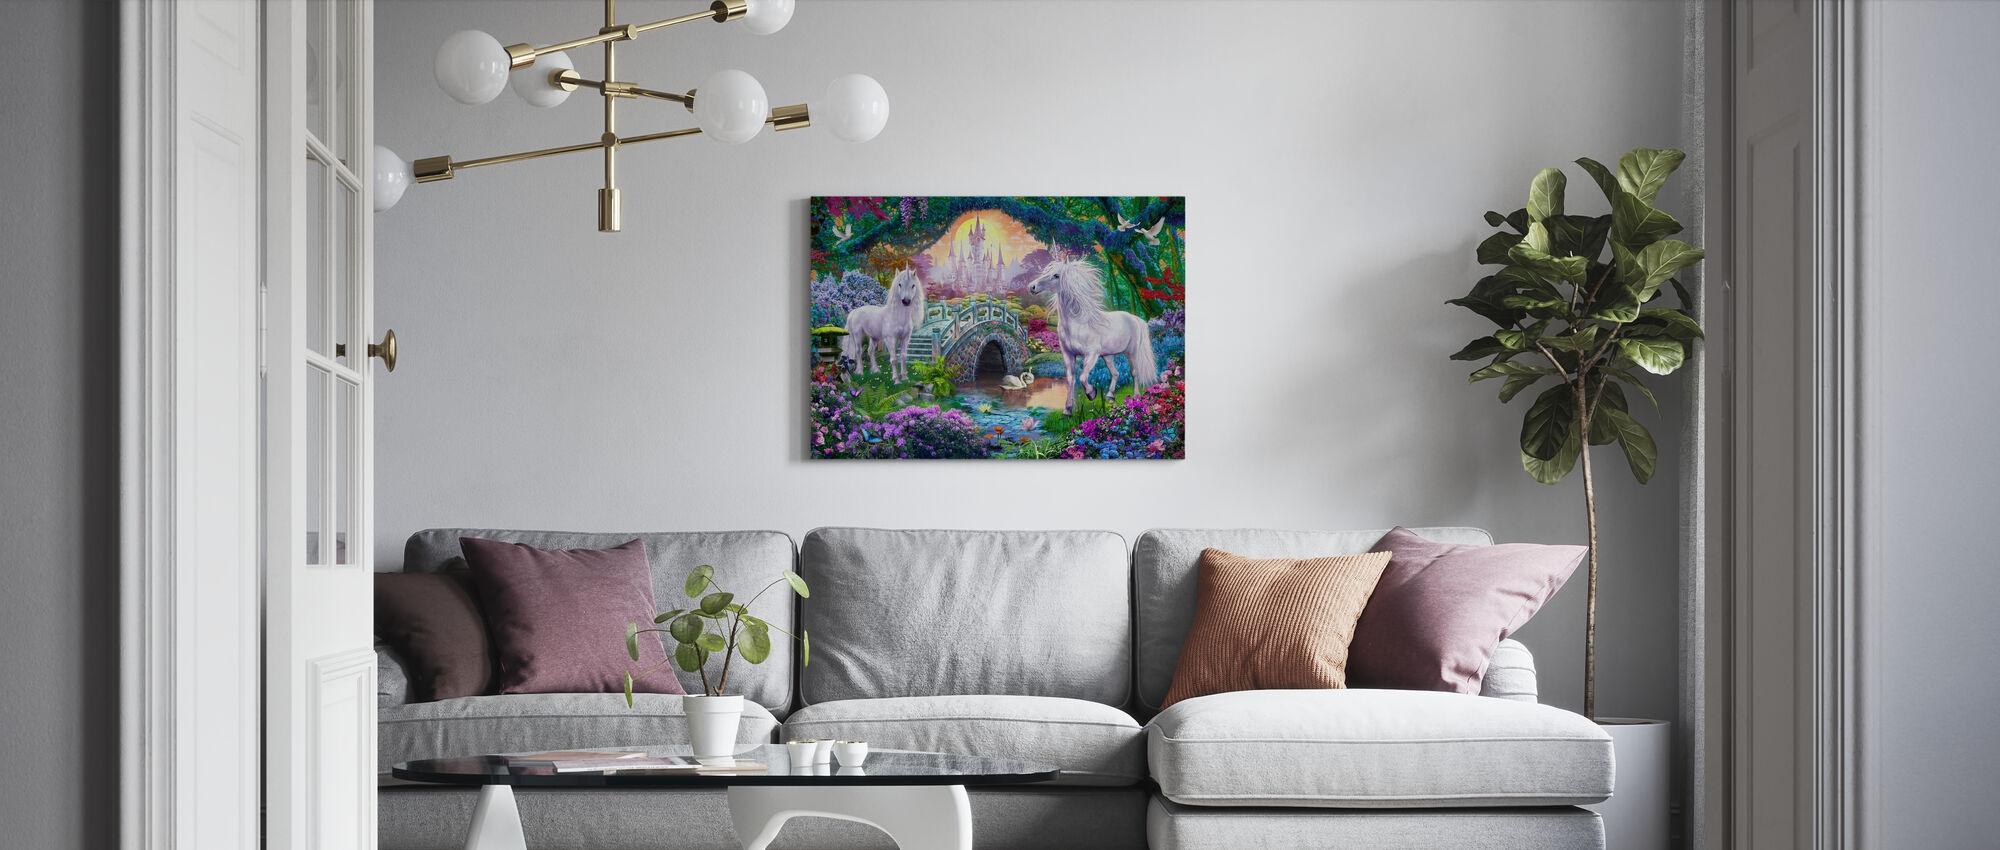 Magical Unicorn Kingdom - Canvas print - Living Room